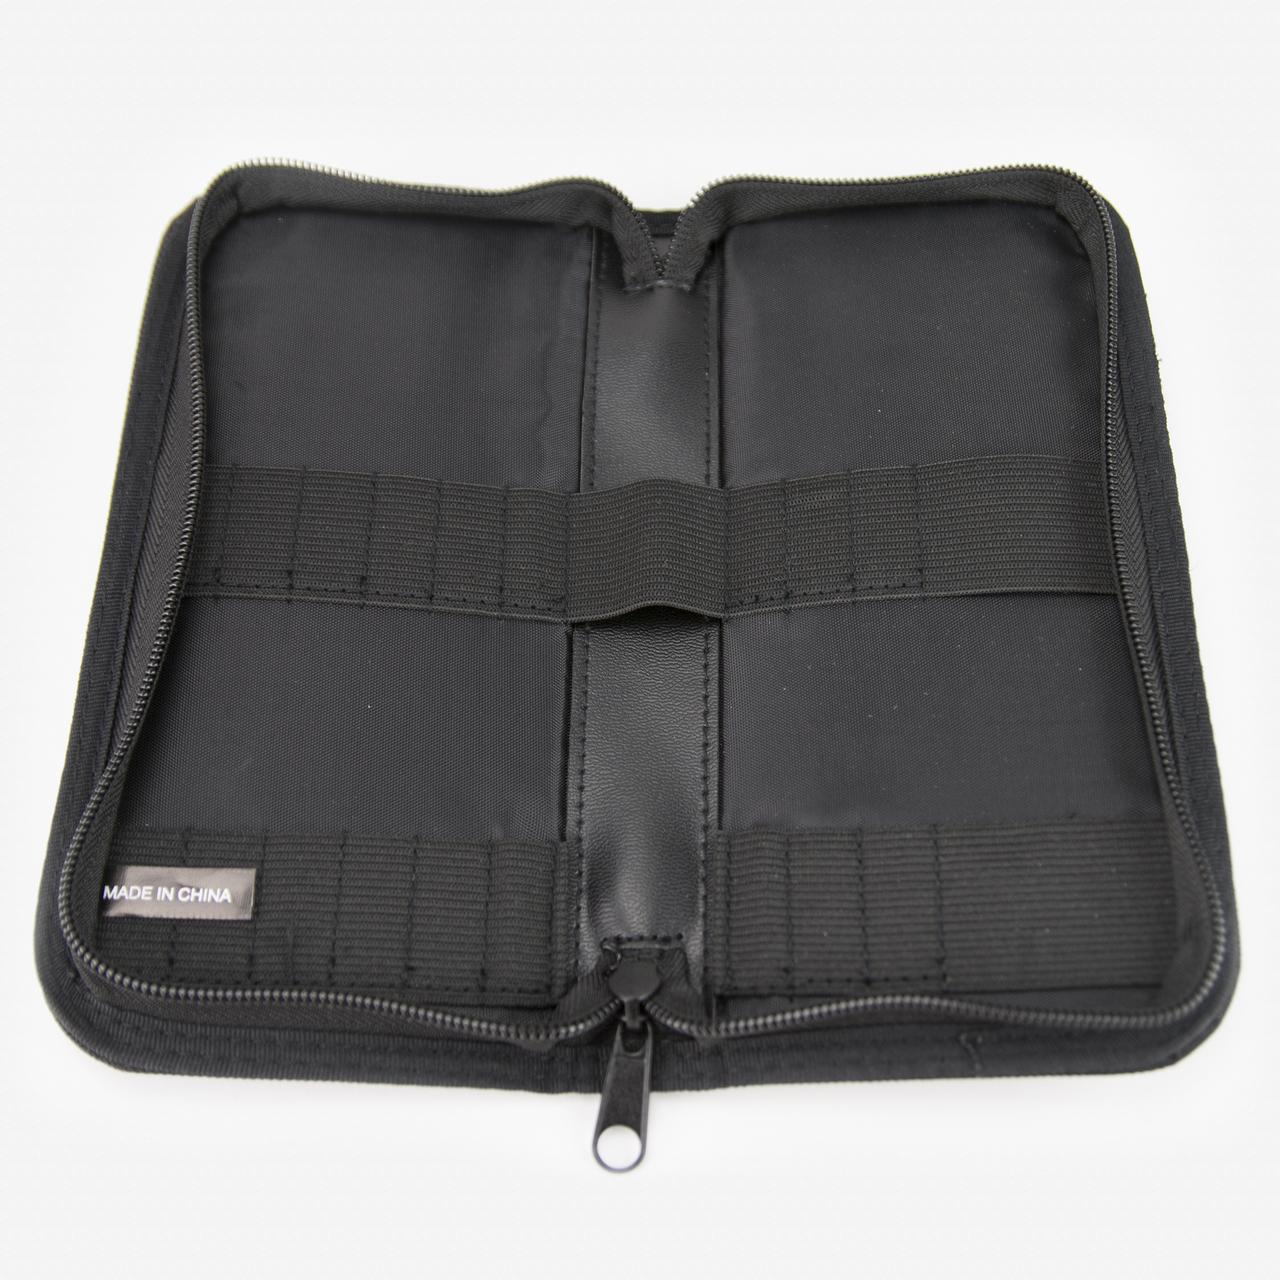 Wiha 91204 Zipper Case for Micro Bits (empty) - KC Tool